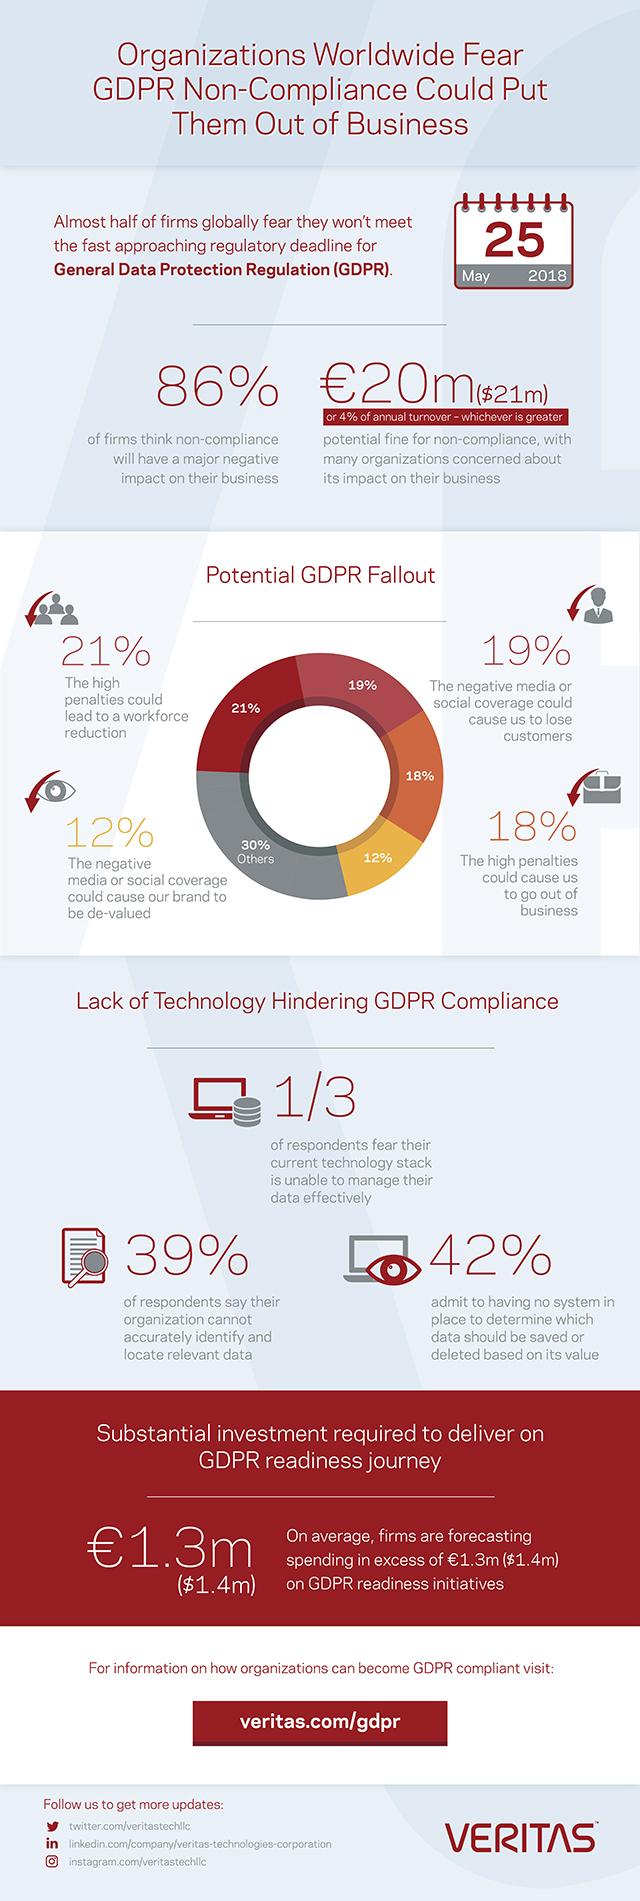 GDPR-Infographic-design-v4